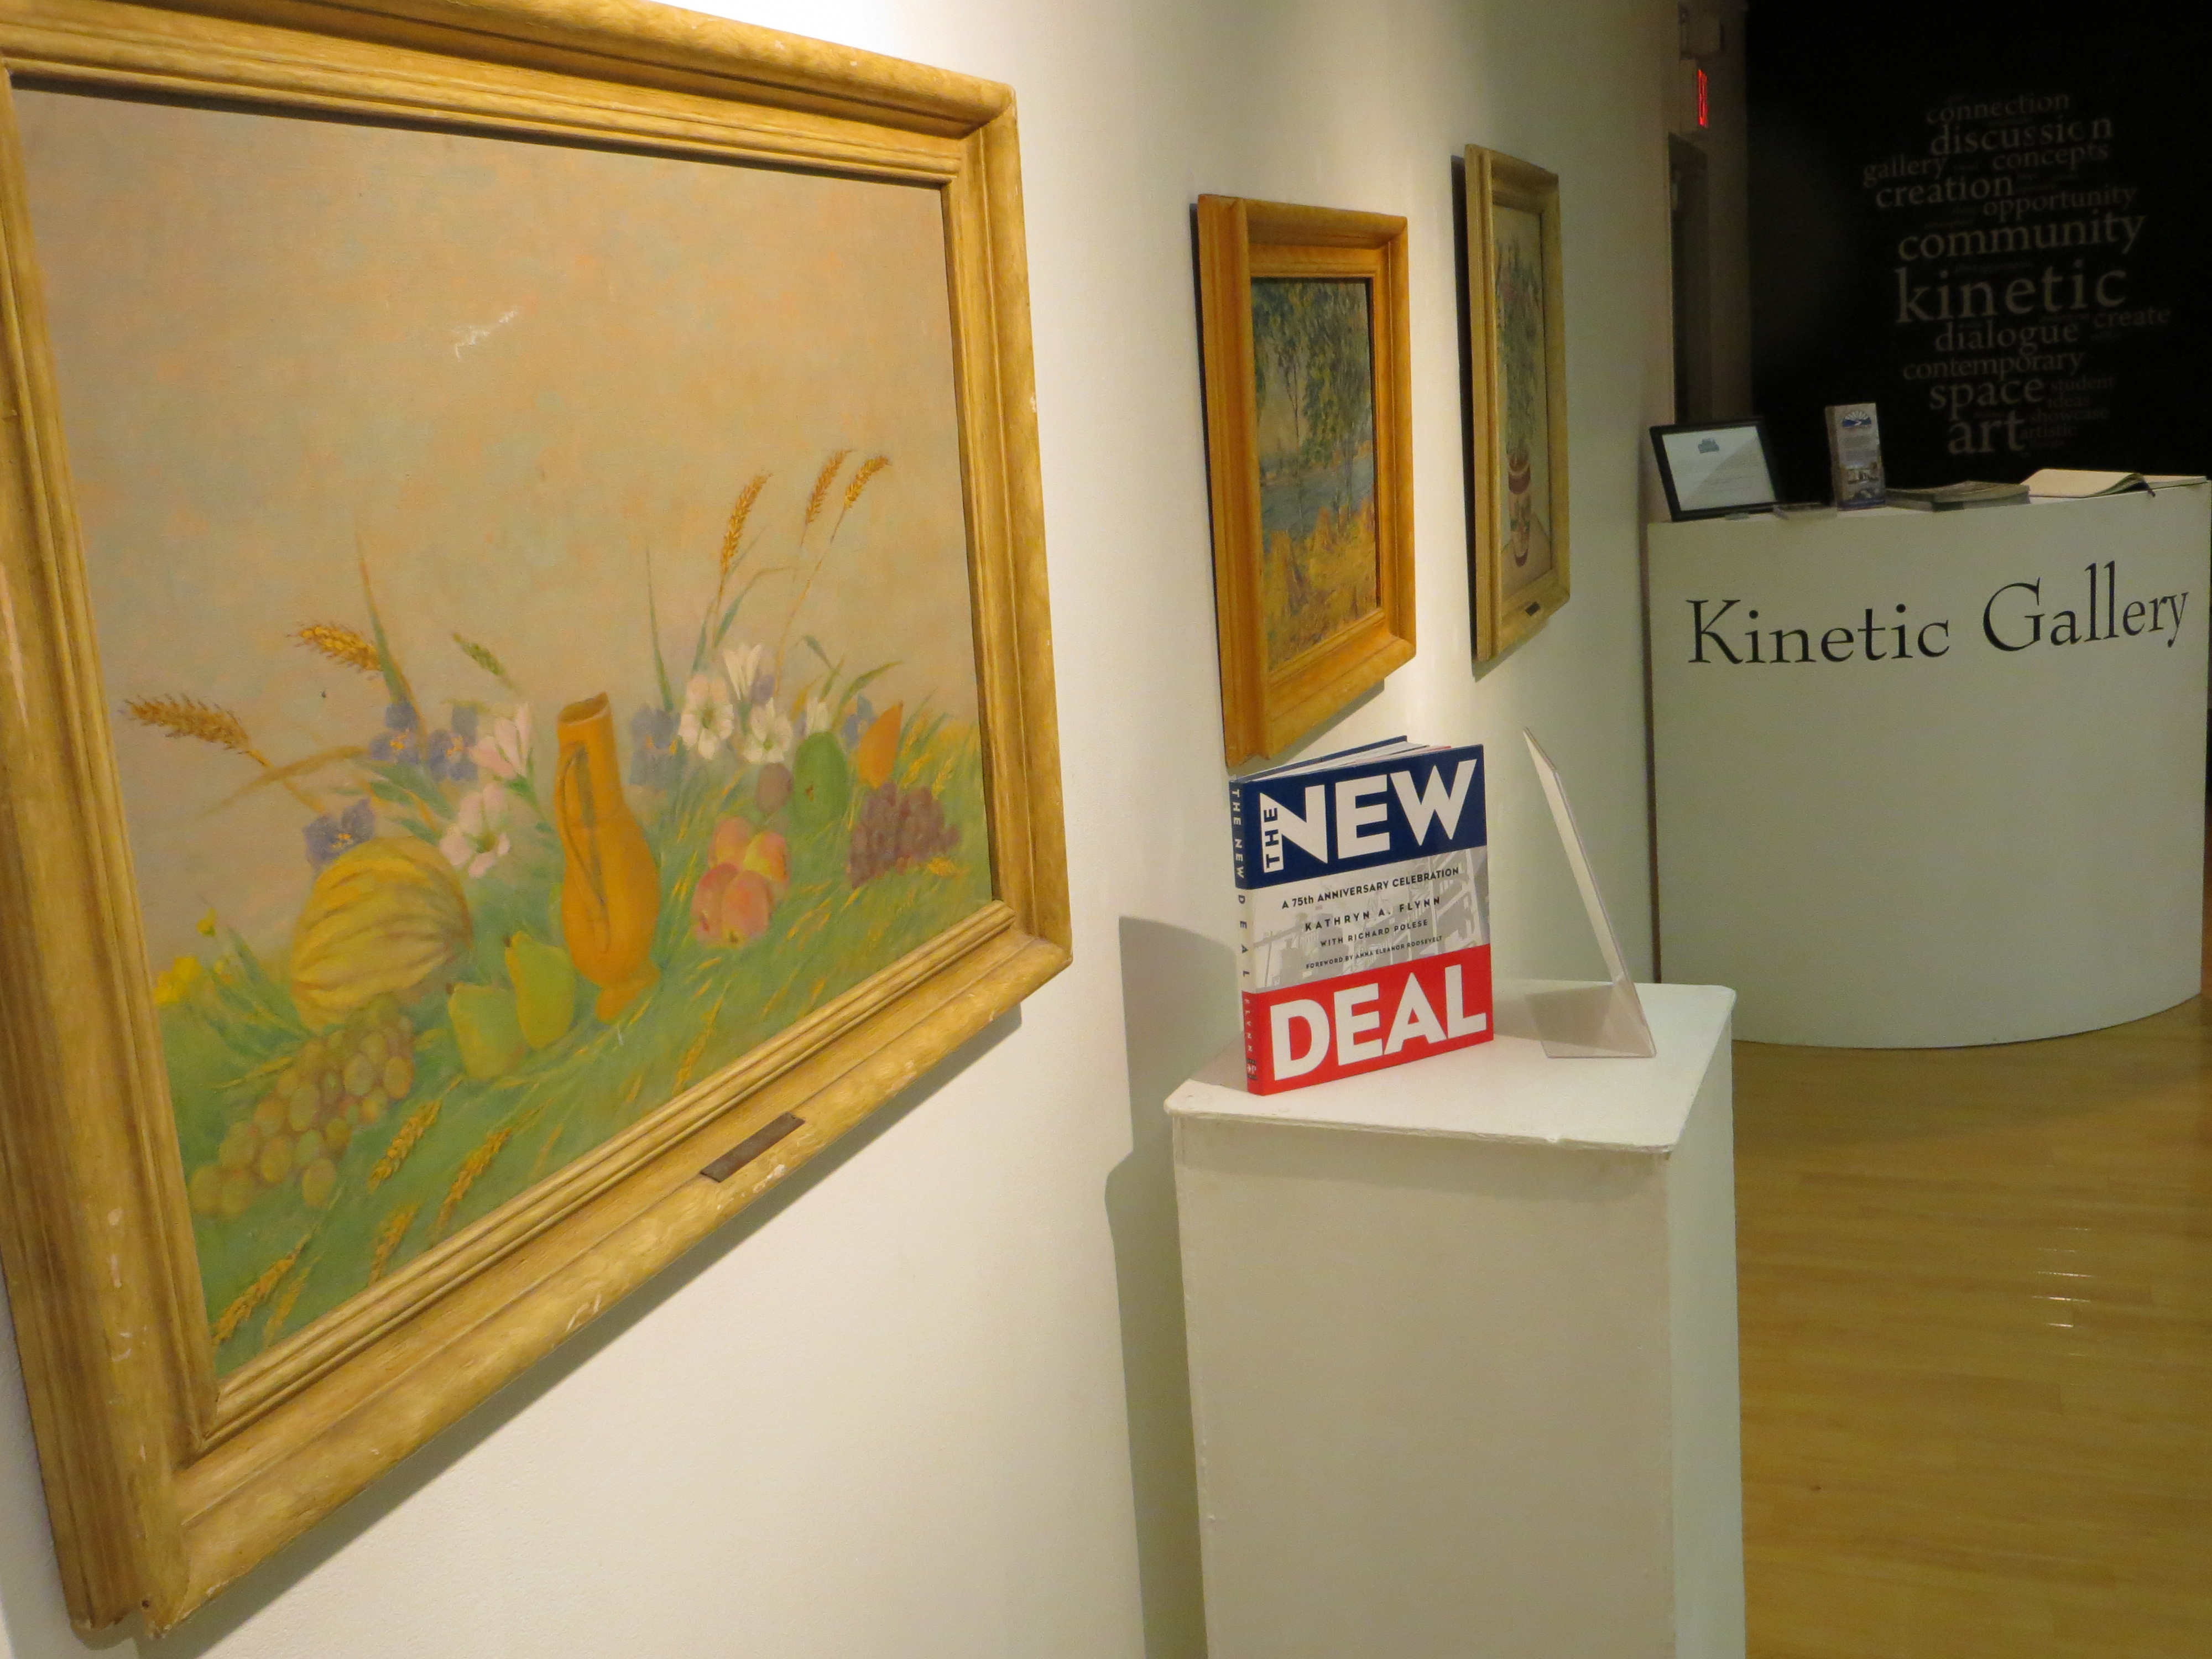 Kinetic Gallery Showcases Authentic 'New Deal Era' Art Exhibit